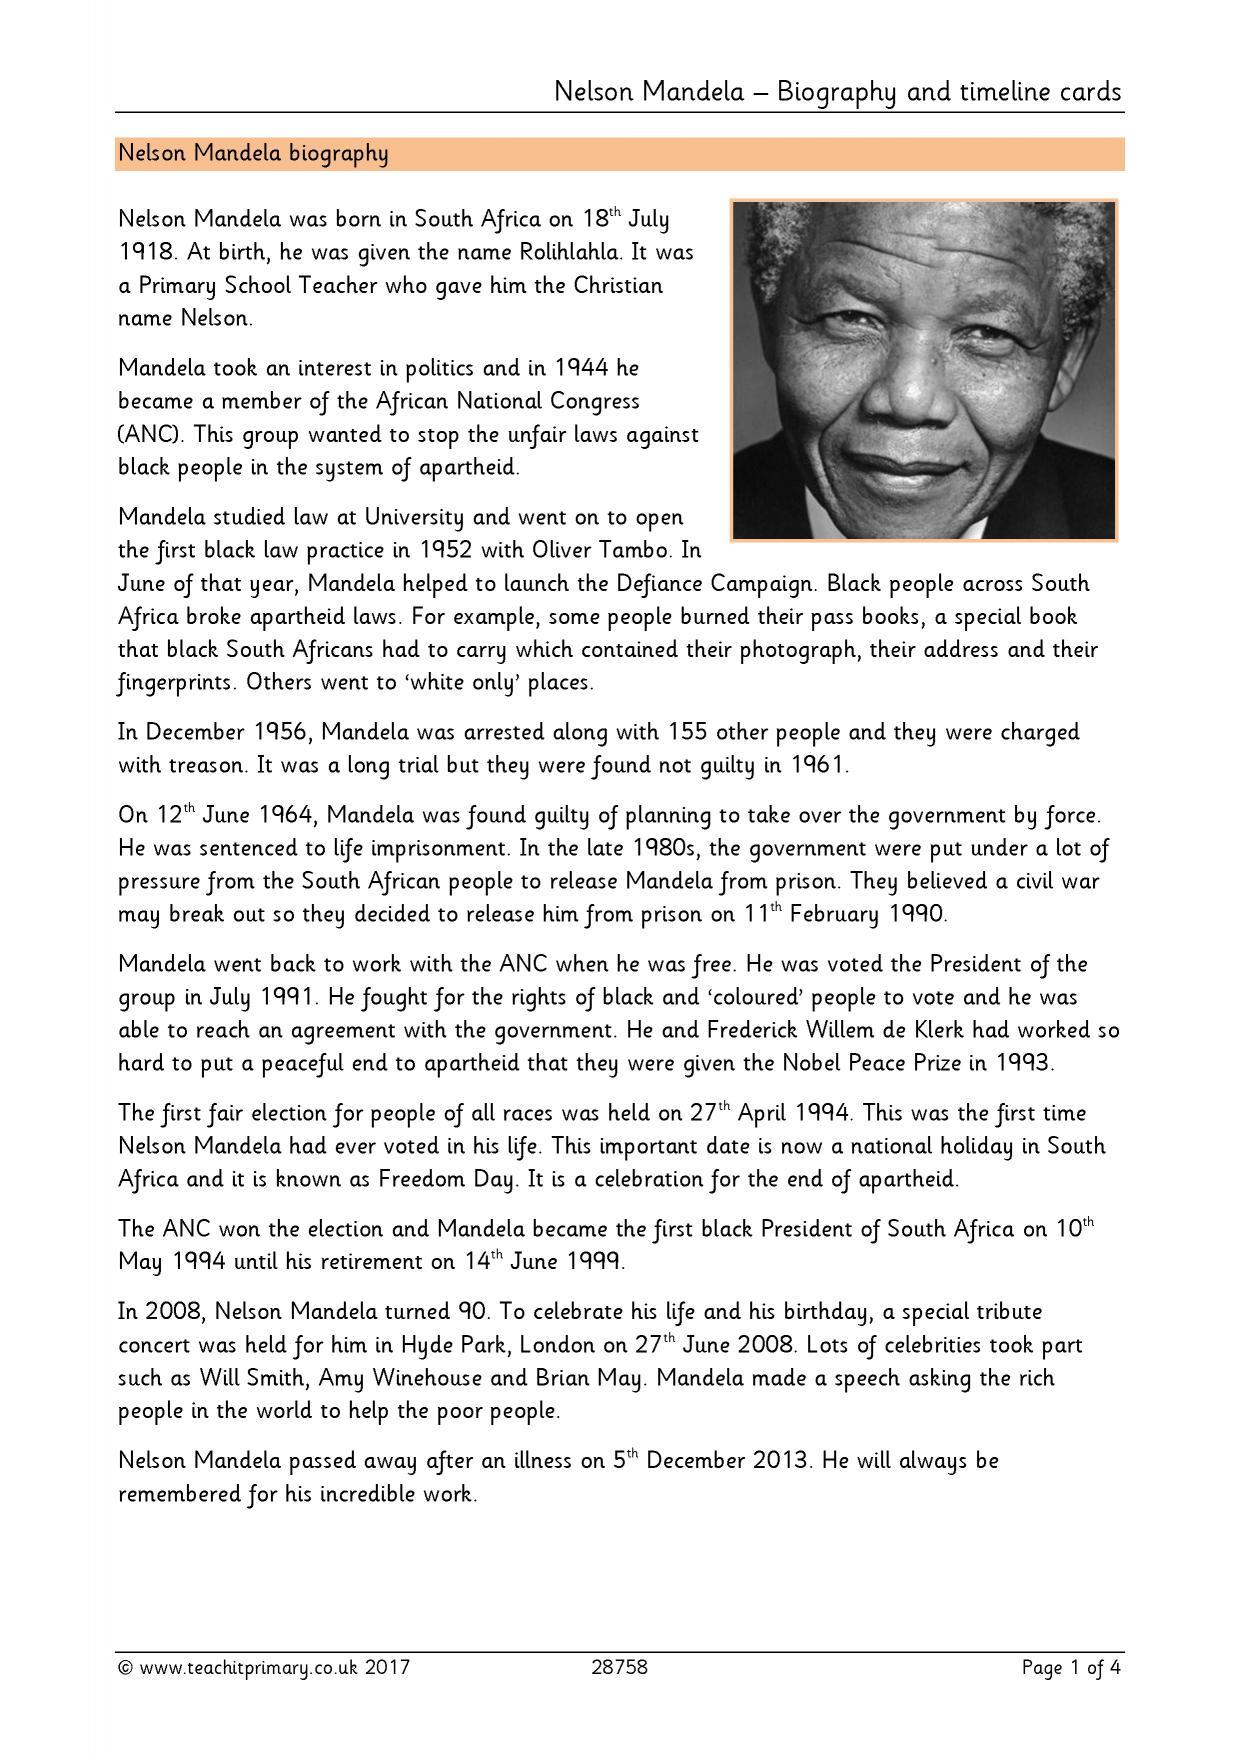 Nelson Mandela Biography And Timeline Cards